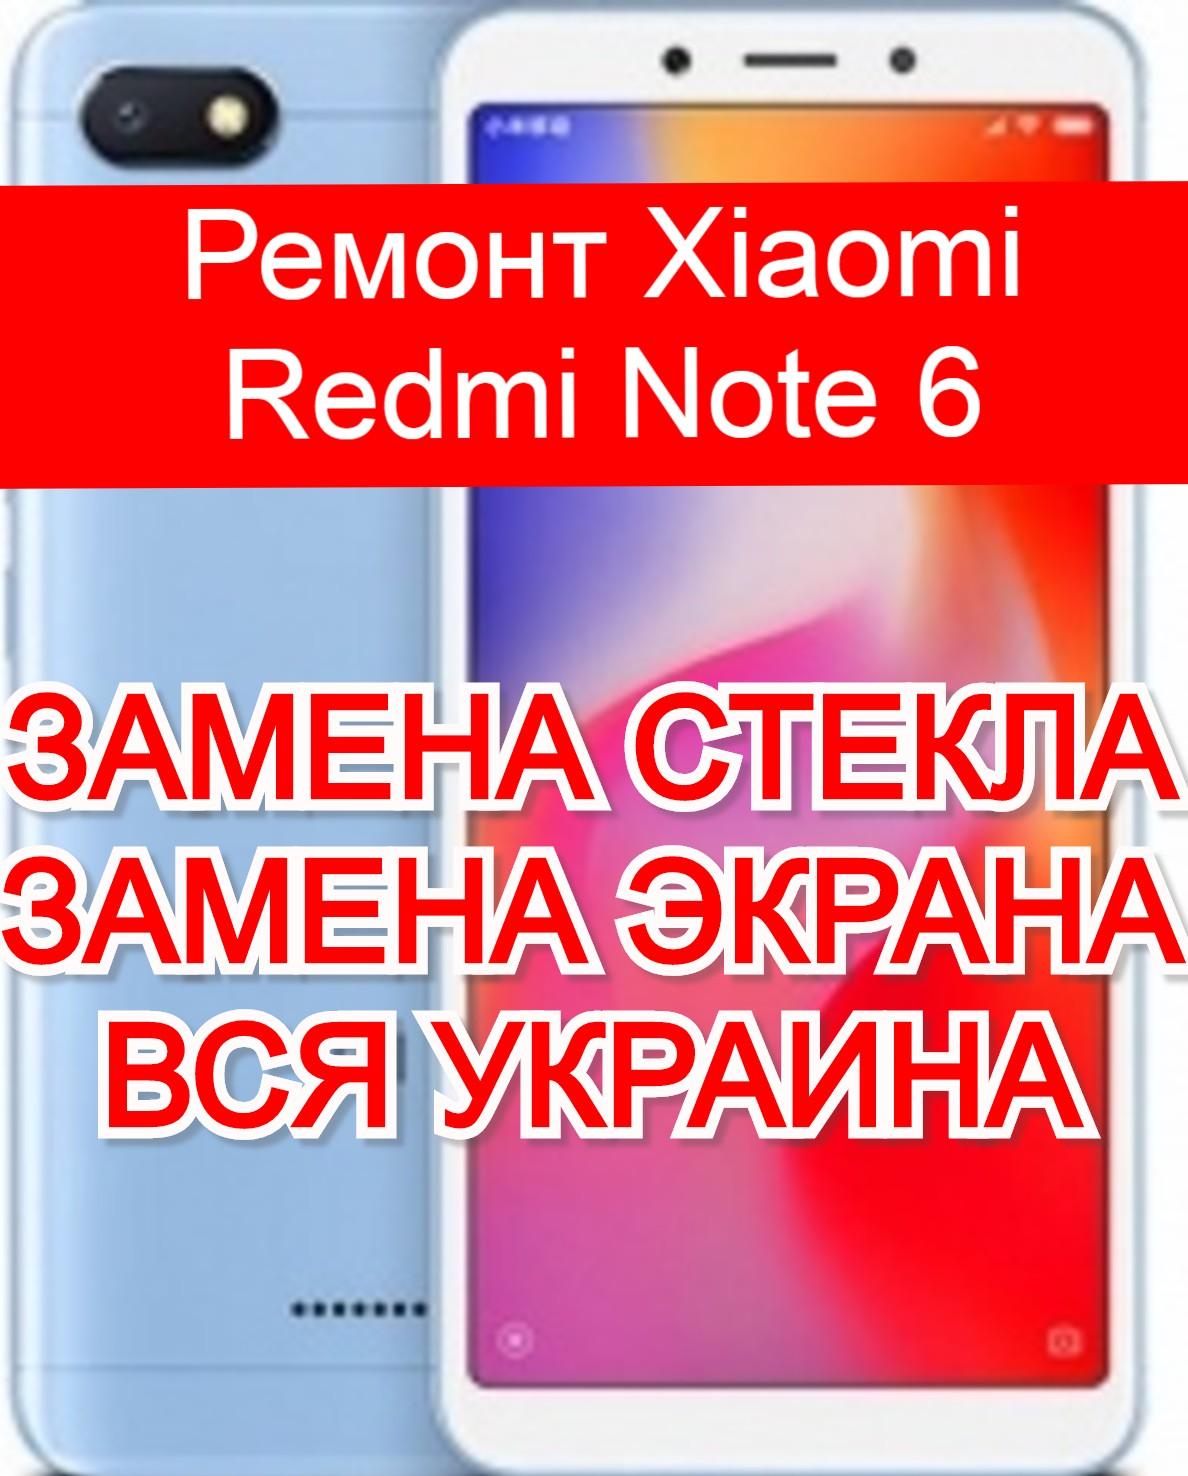 ремонт Xiaomi Redmi Note 6 замена стекла и экрана